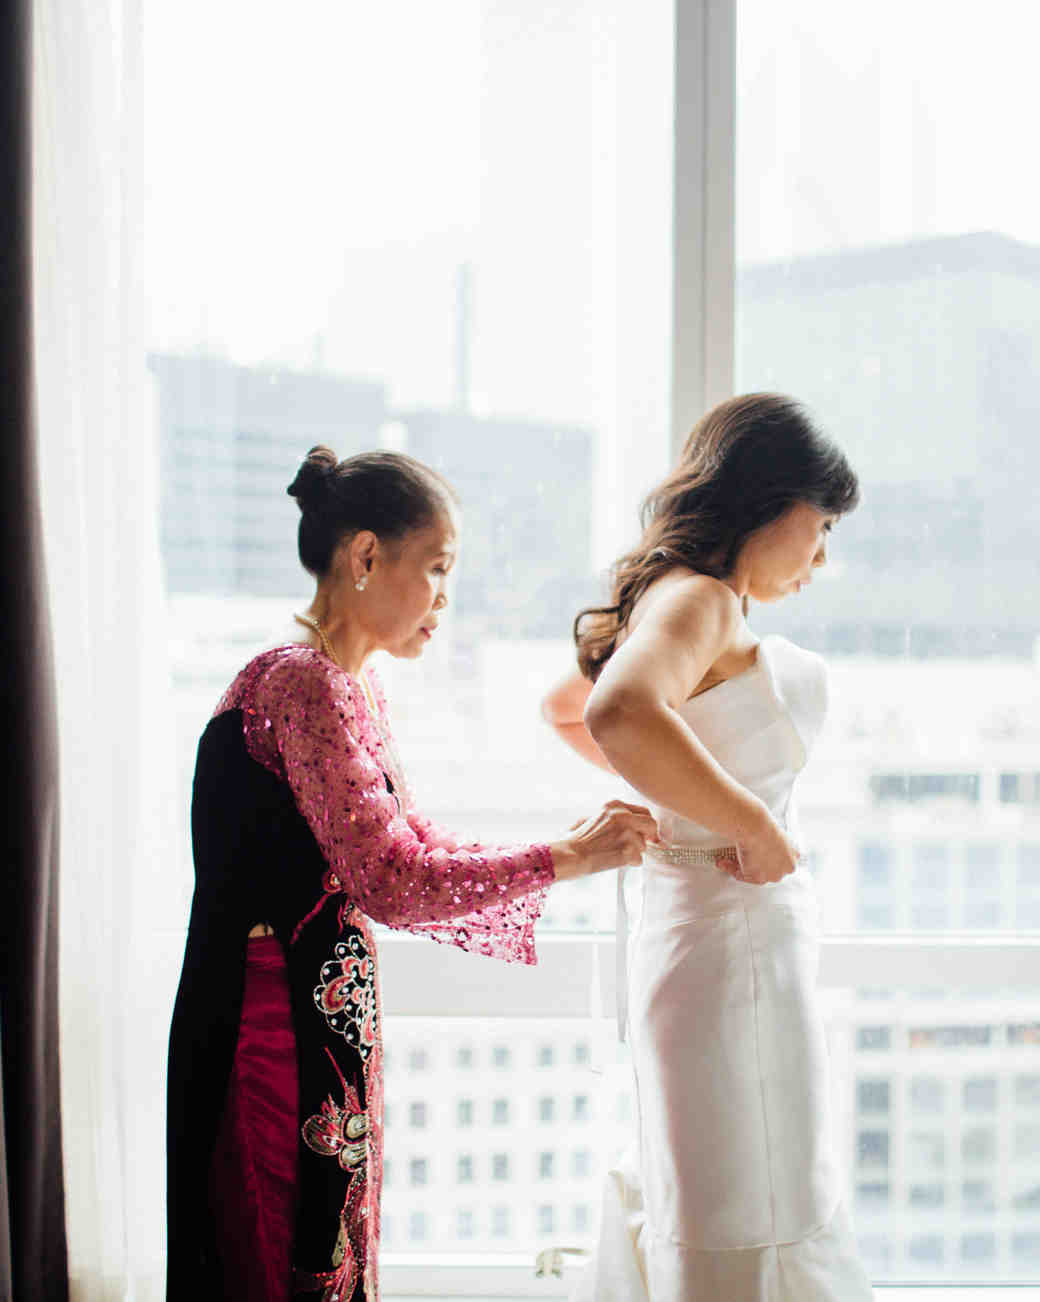 A Mother Zipping Up Her Daughter's Wedding Dress